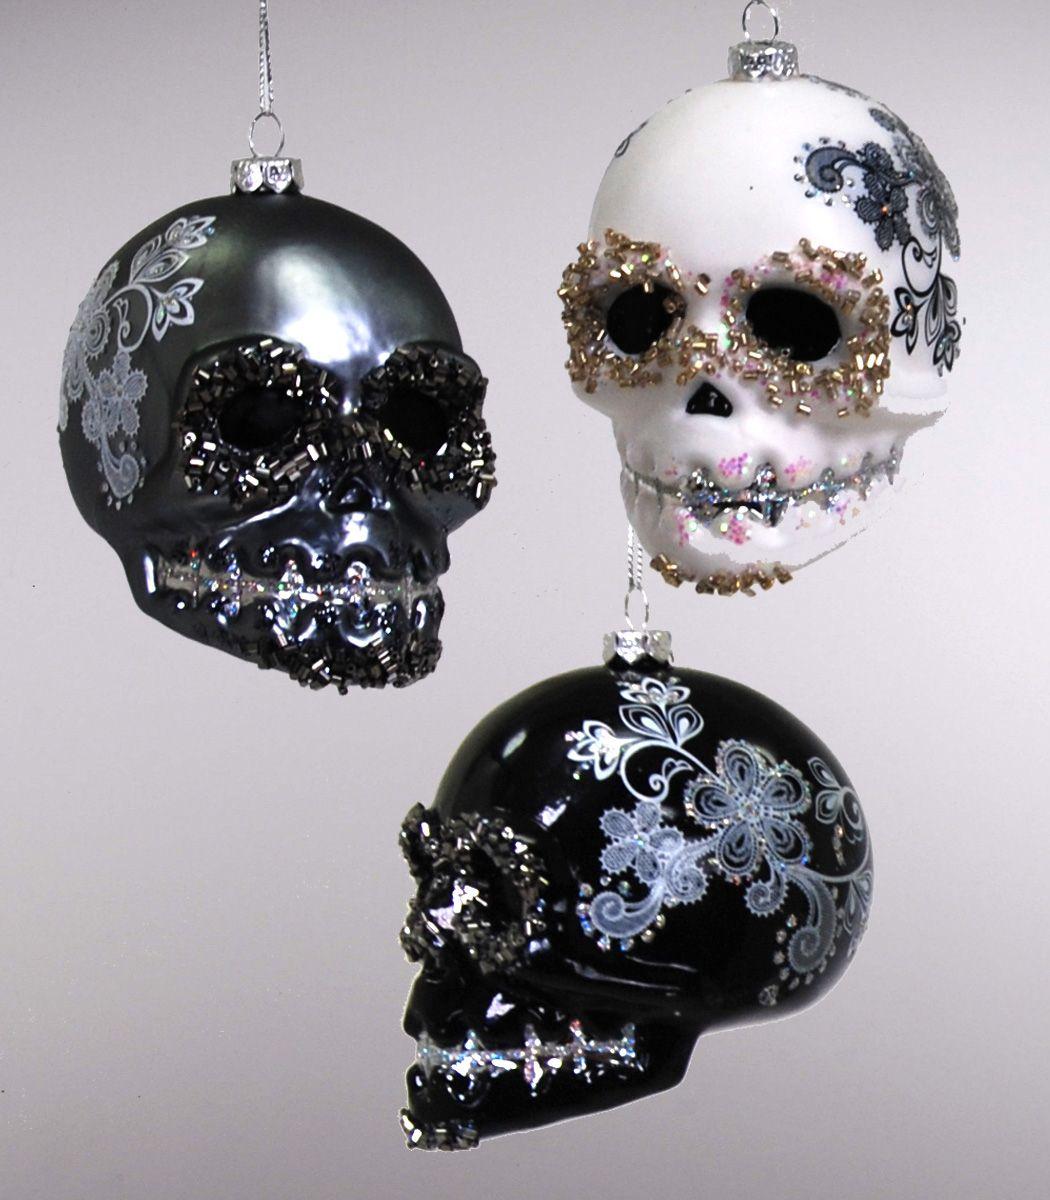 37 best Christmas stuff images on Pinterest | Skulls, Xmas and ...